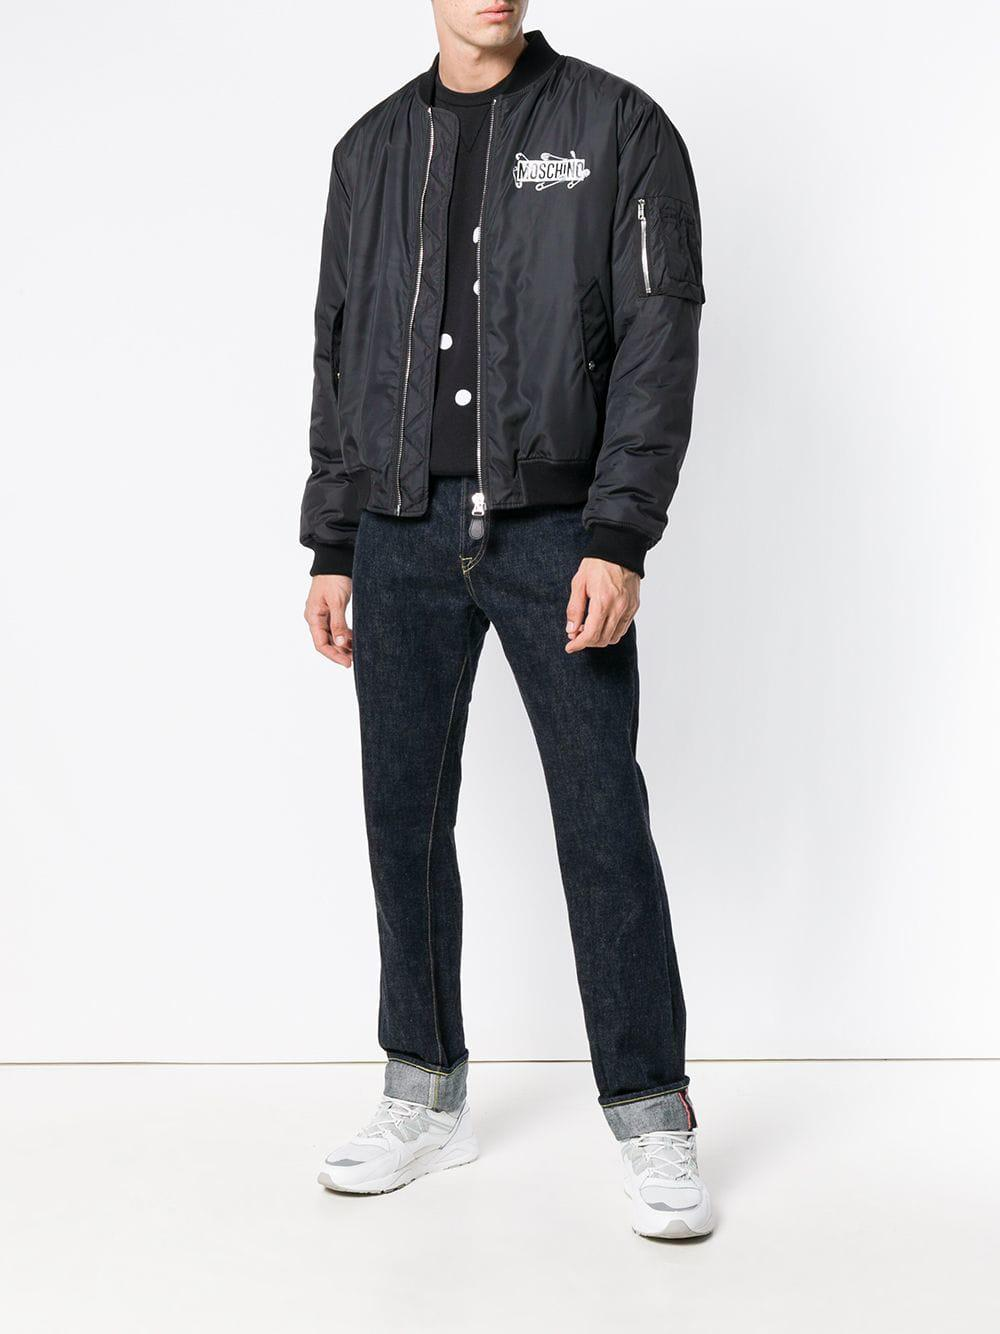 be7f9cf60 Men's Black Logo Zipped Bomber Jacket